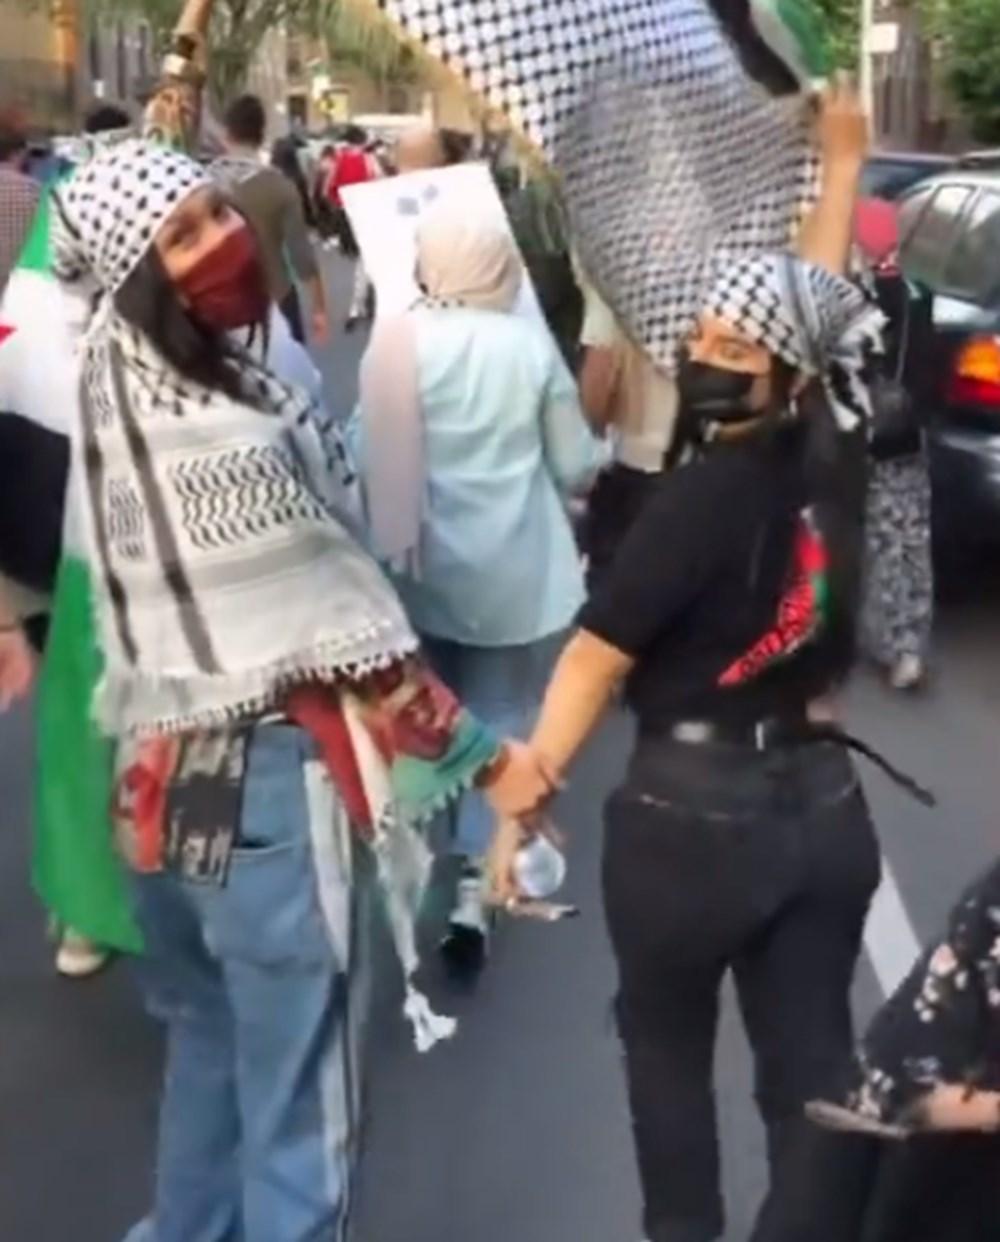 Ünlü model Bella Hadid, sokaklarda Filistin eyleminde